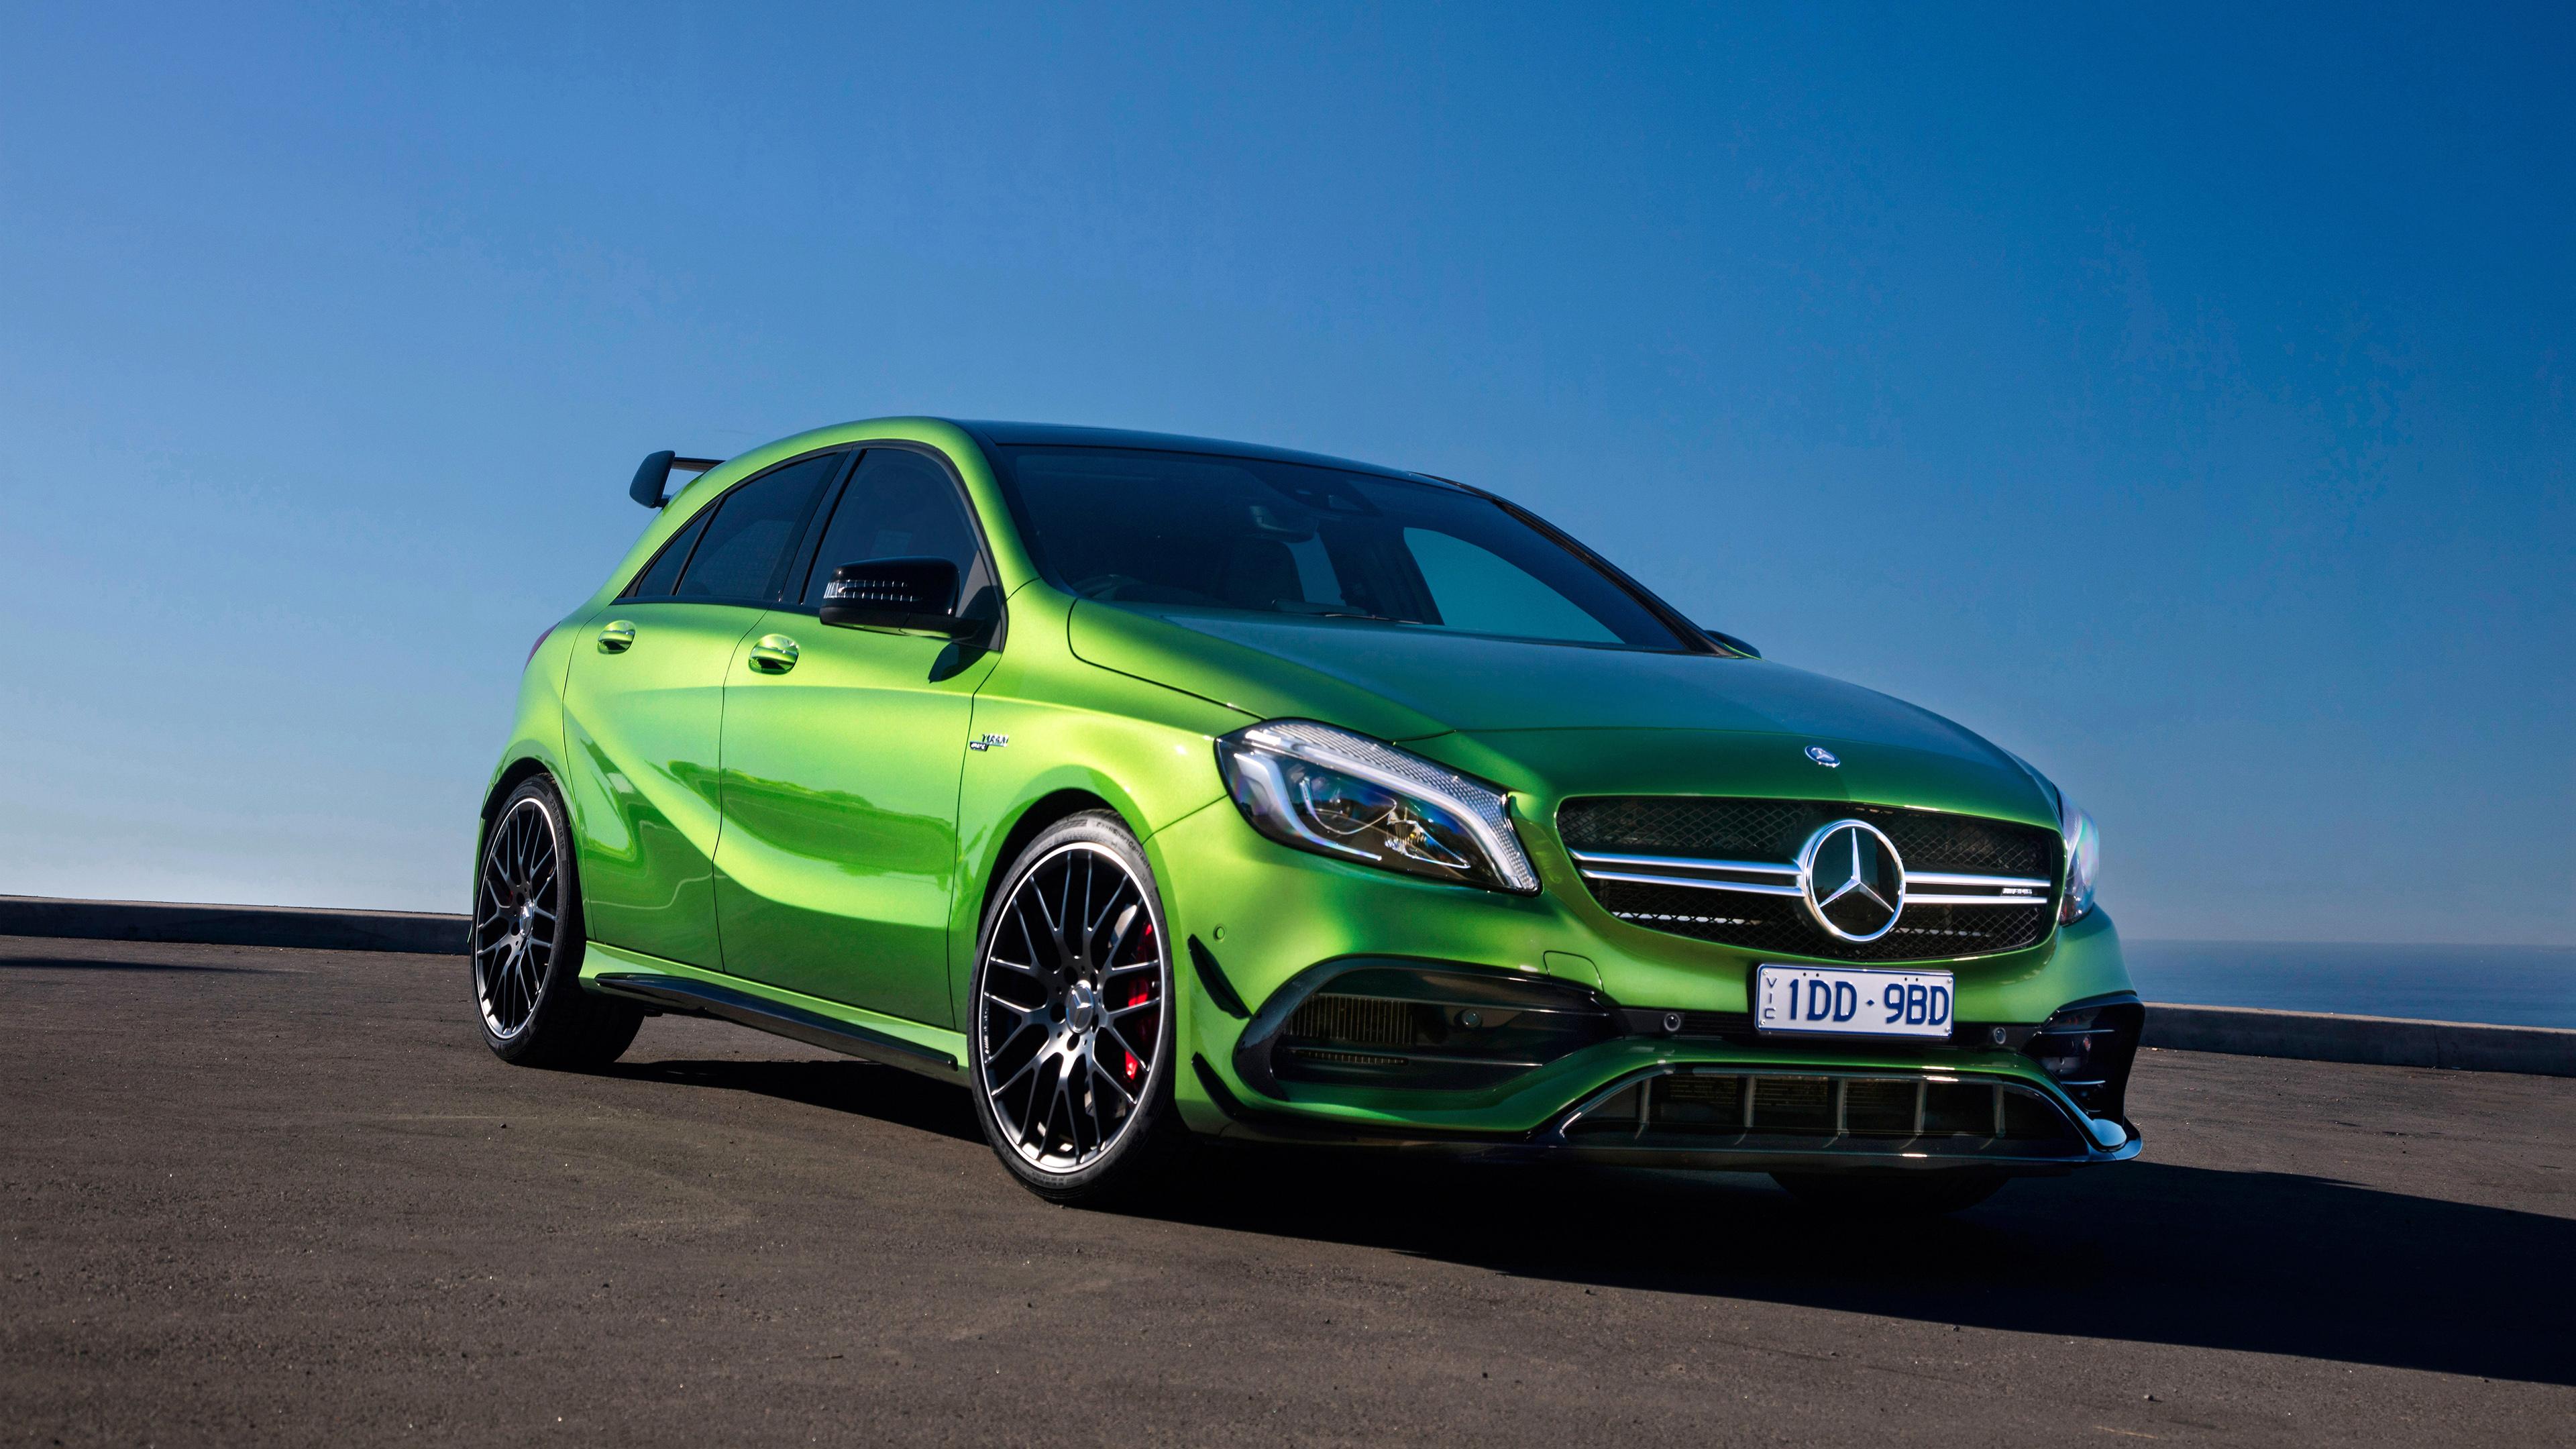 Mercedes Benz C63 Hd Wallpaper For Desktop Car Wallpapers 3840x2160